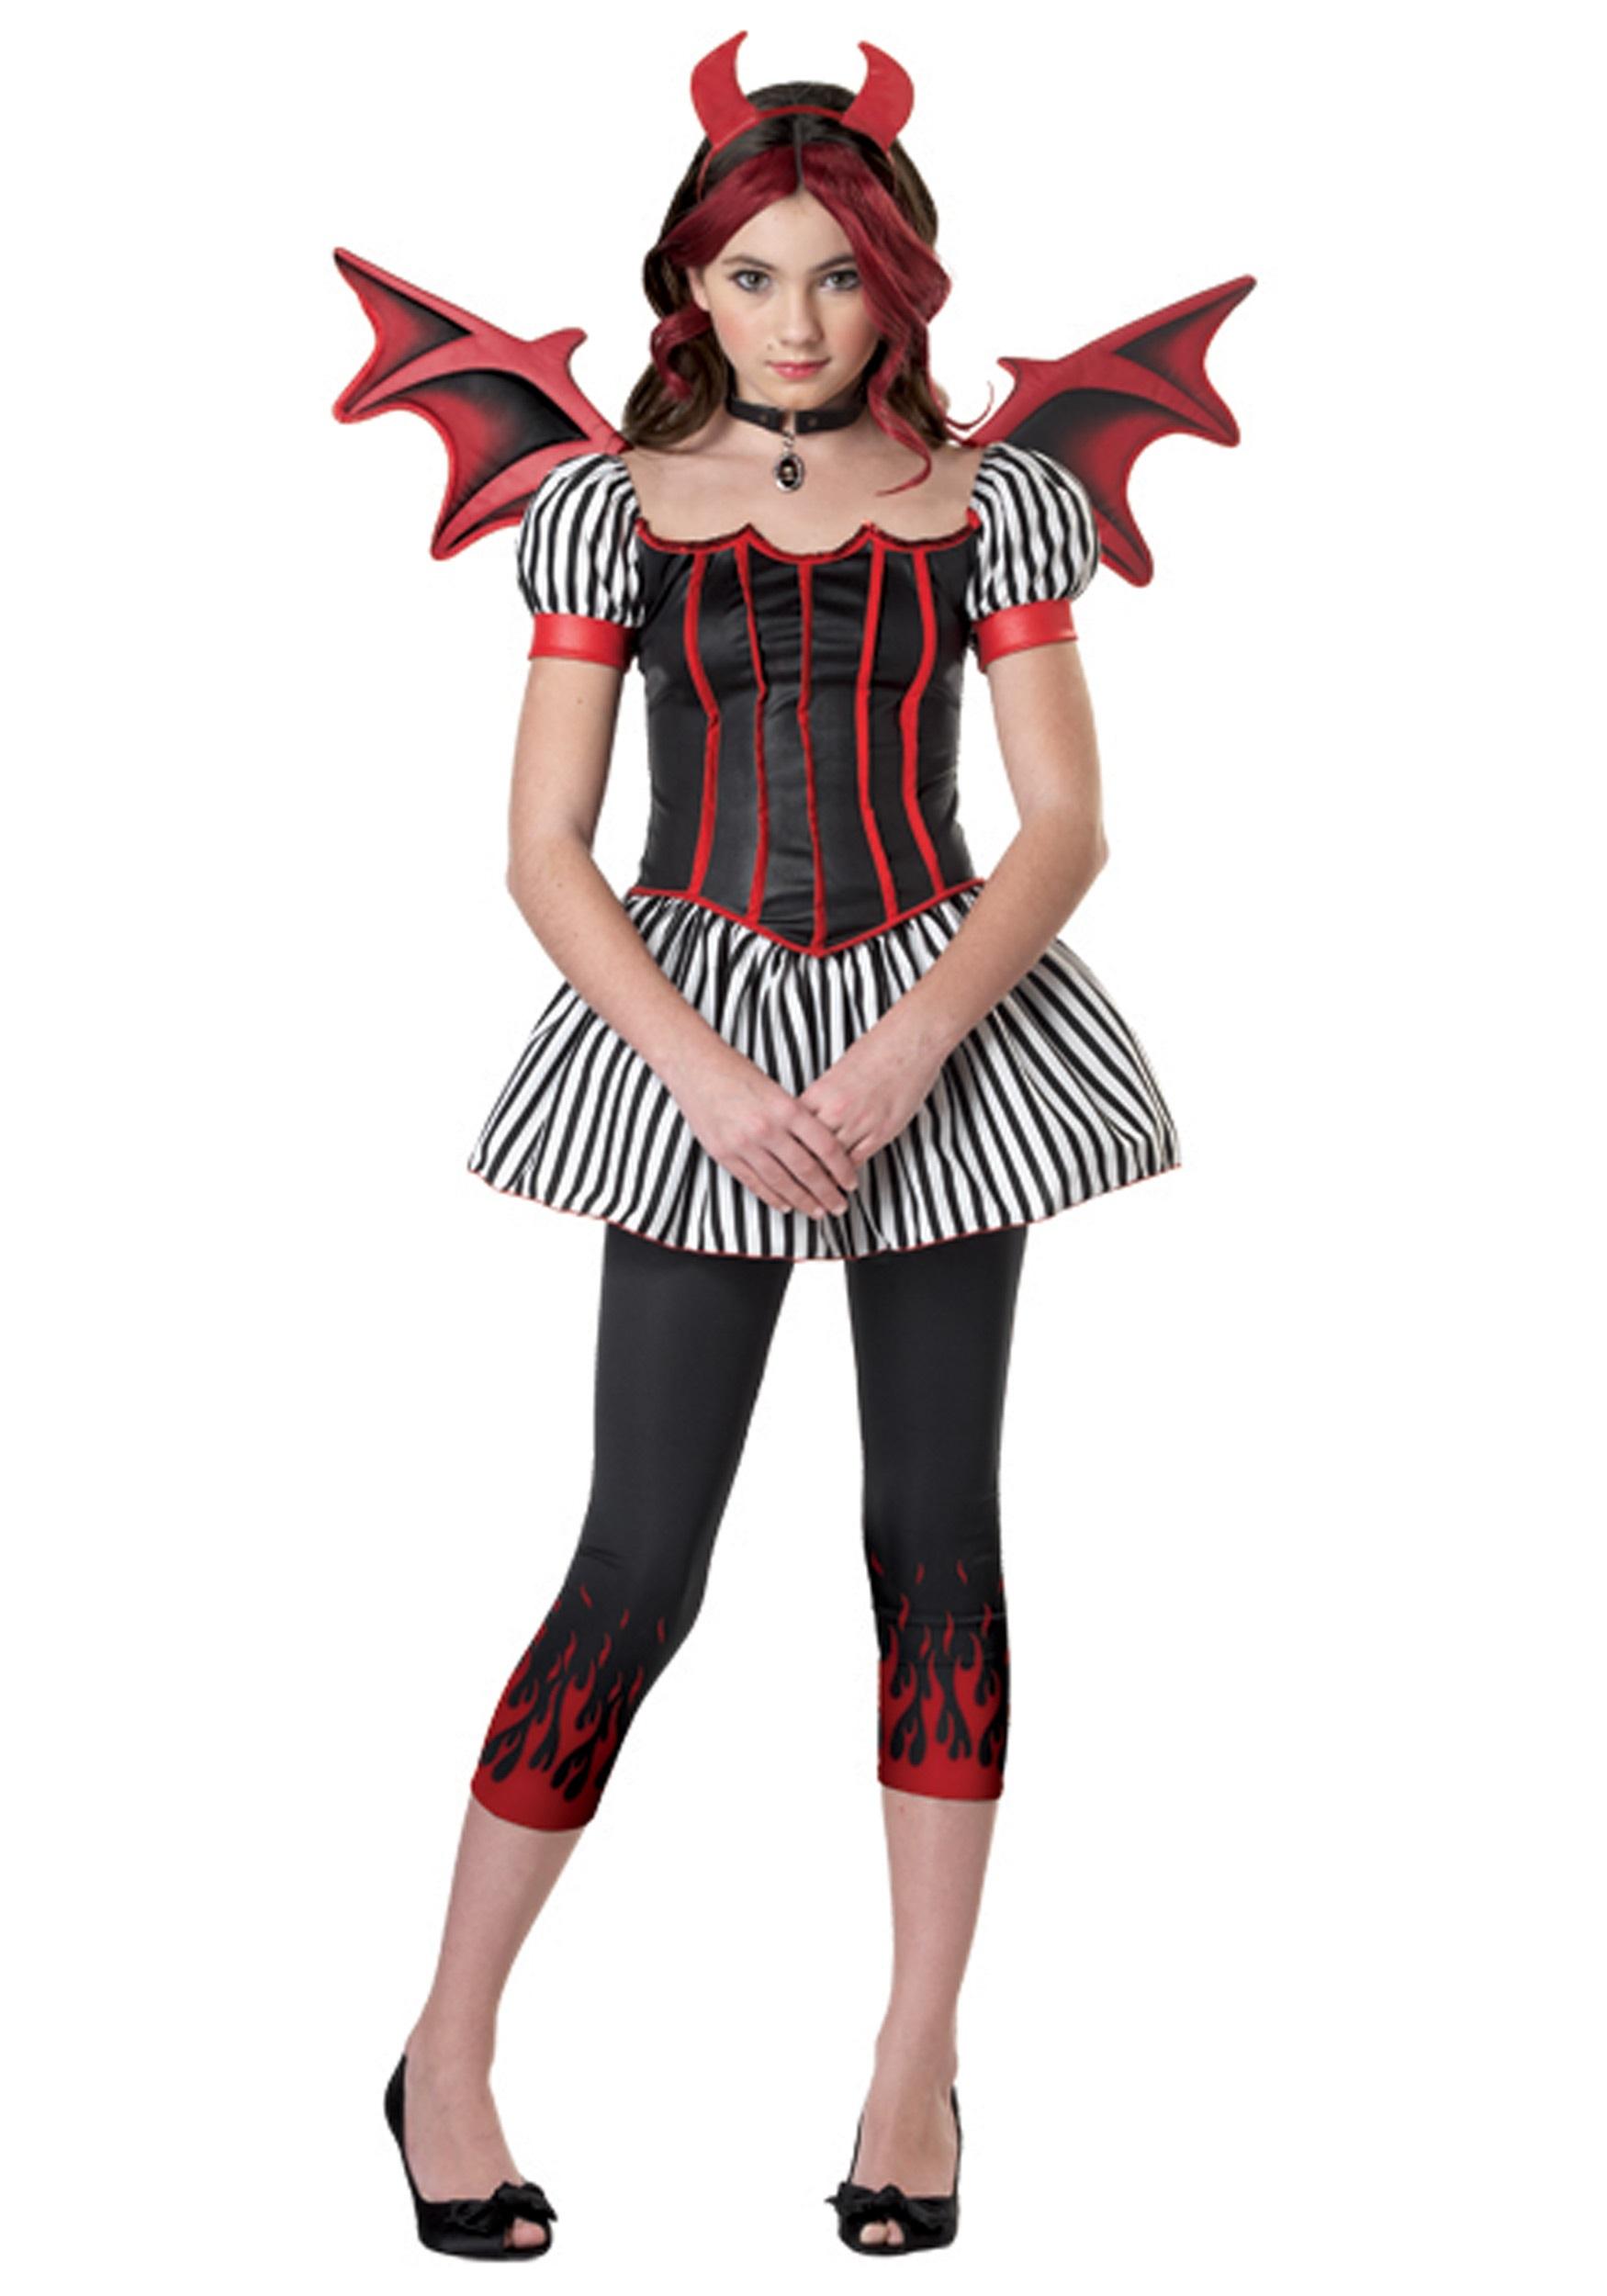 Sexy costumes, slutty costumes, sexy halloween costume ideas